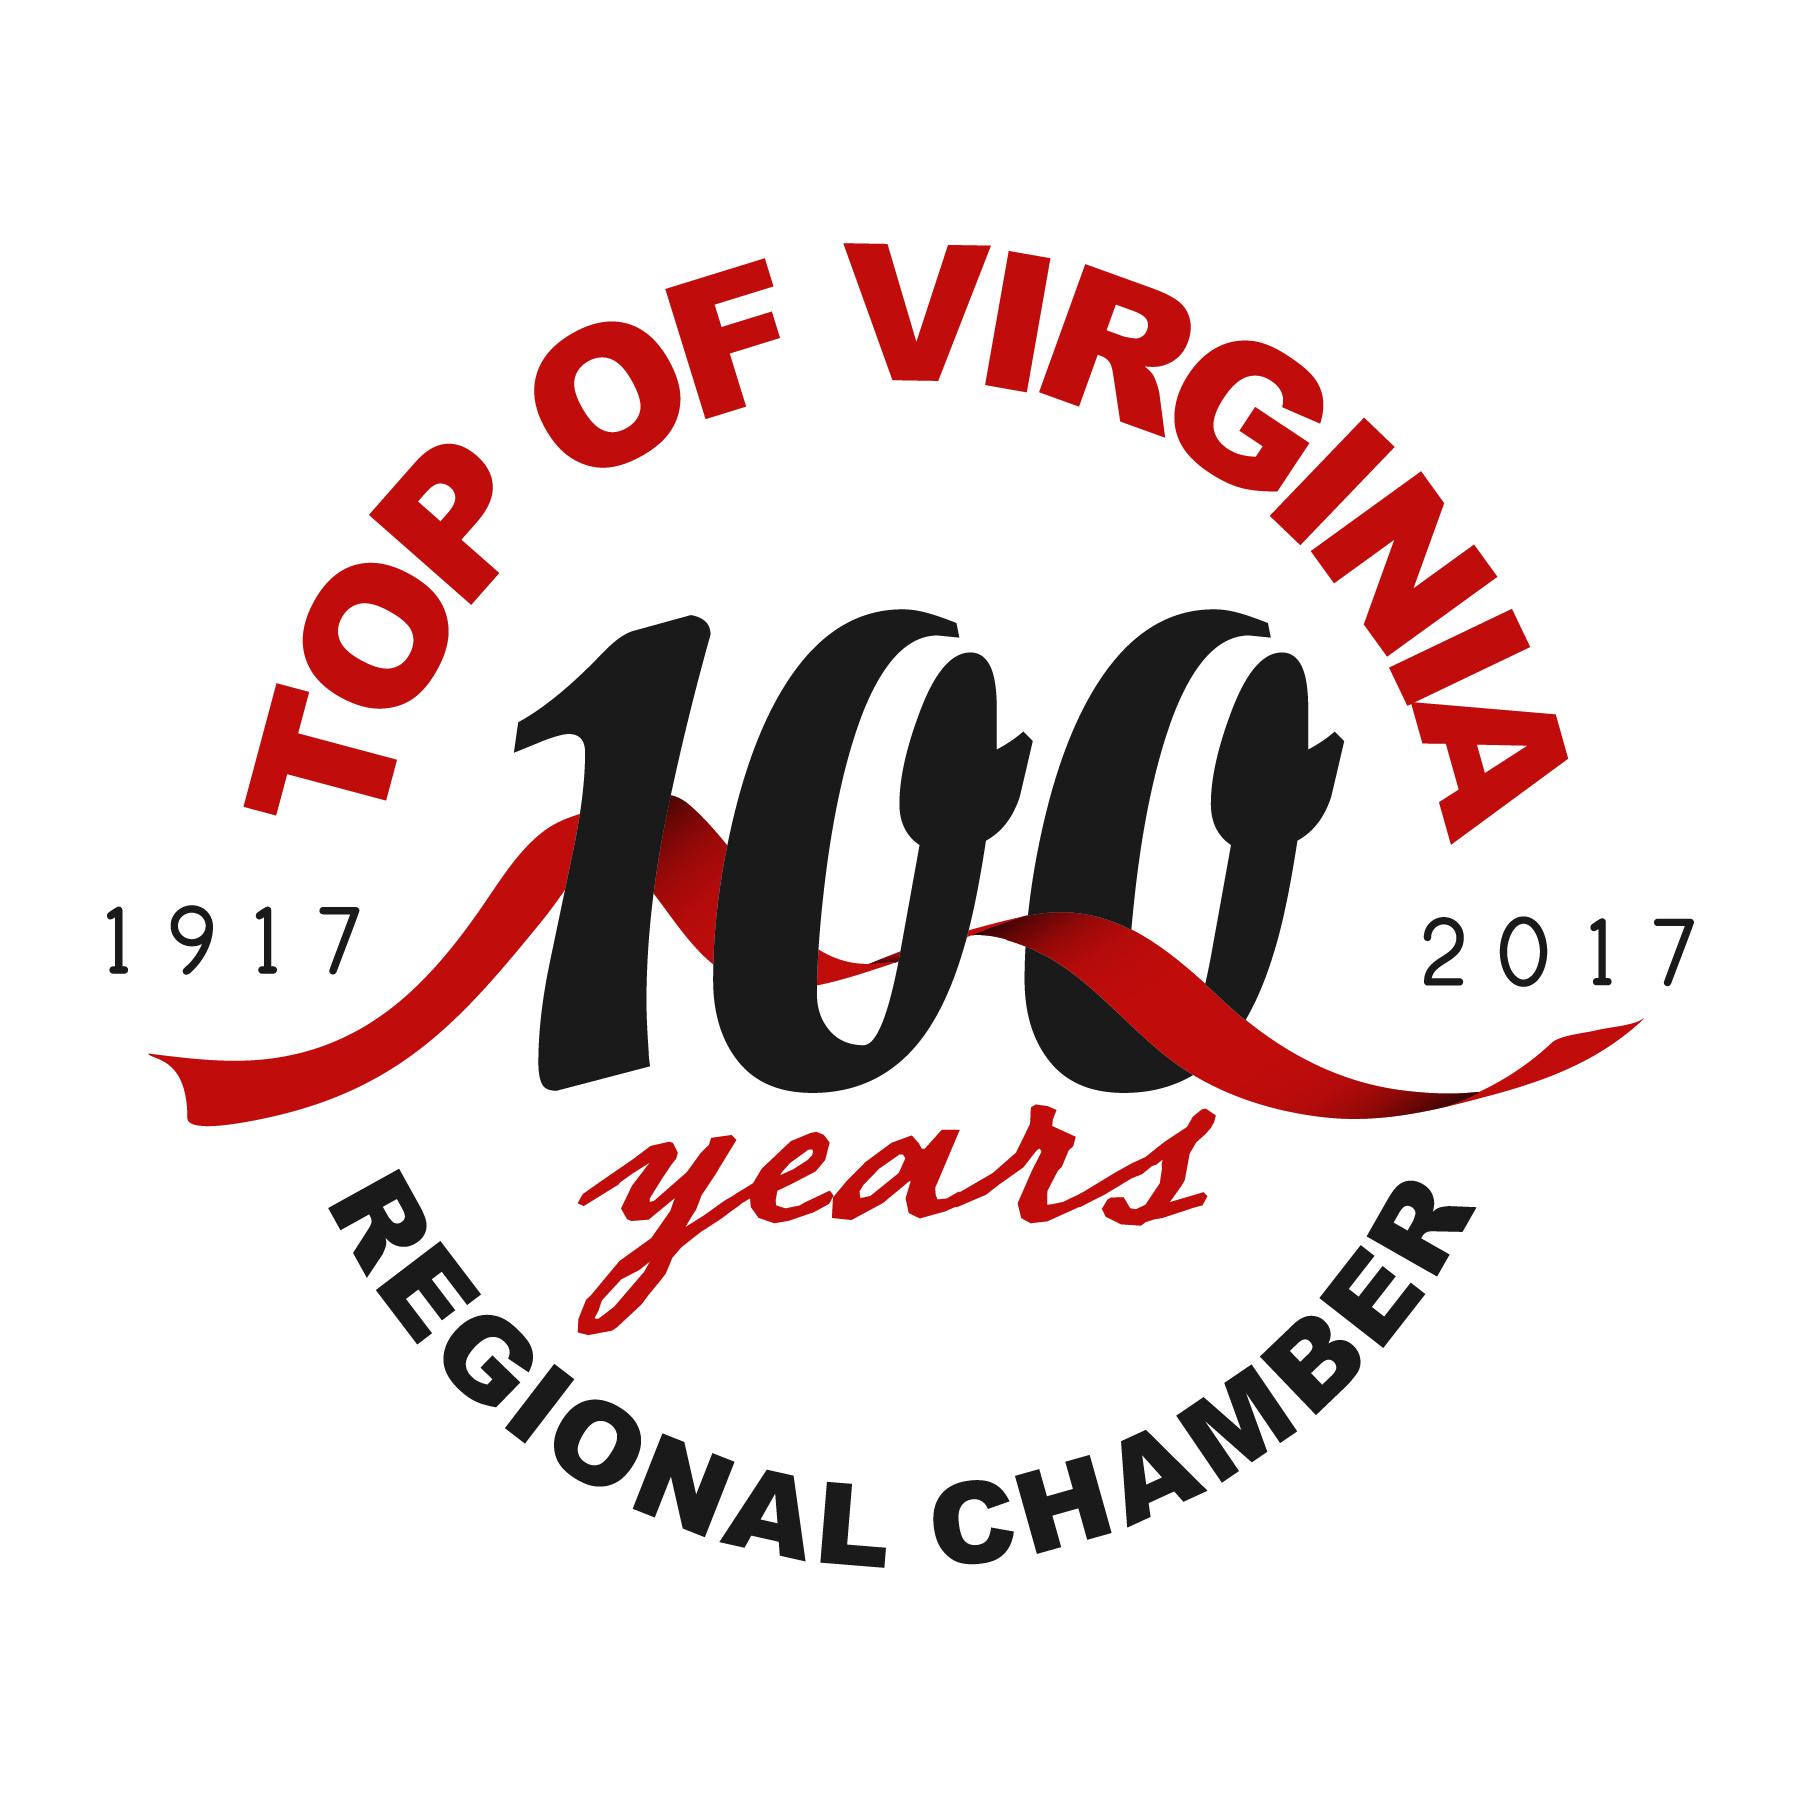 100th anniversary logo contest survey 10th anniversary logos clip art 100th Anniversary Clip Art